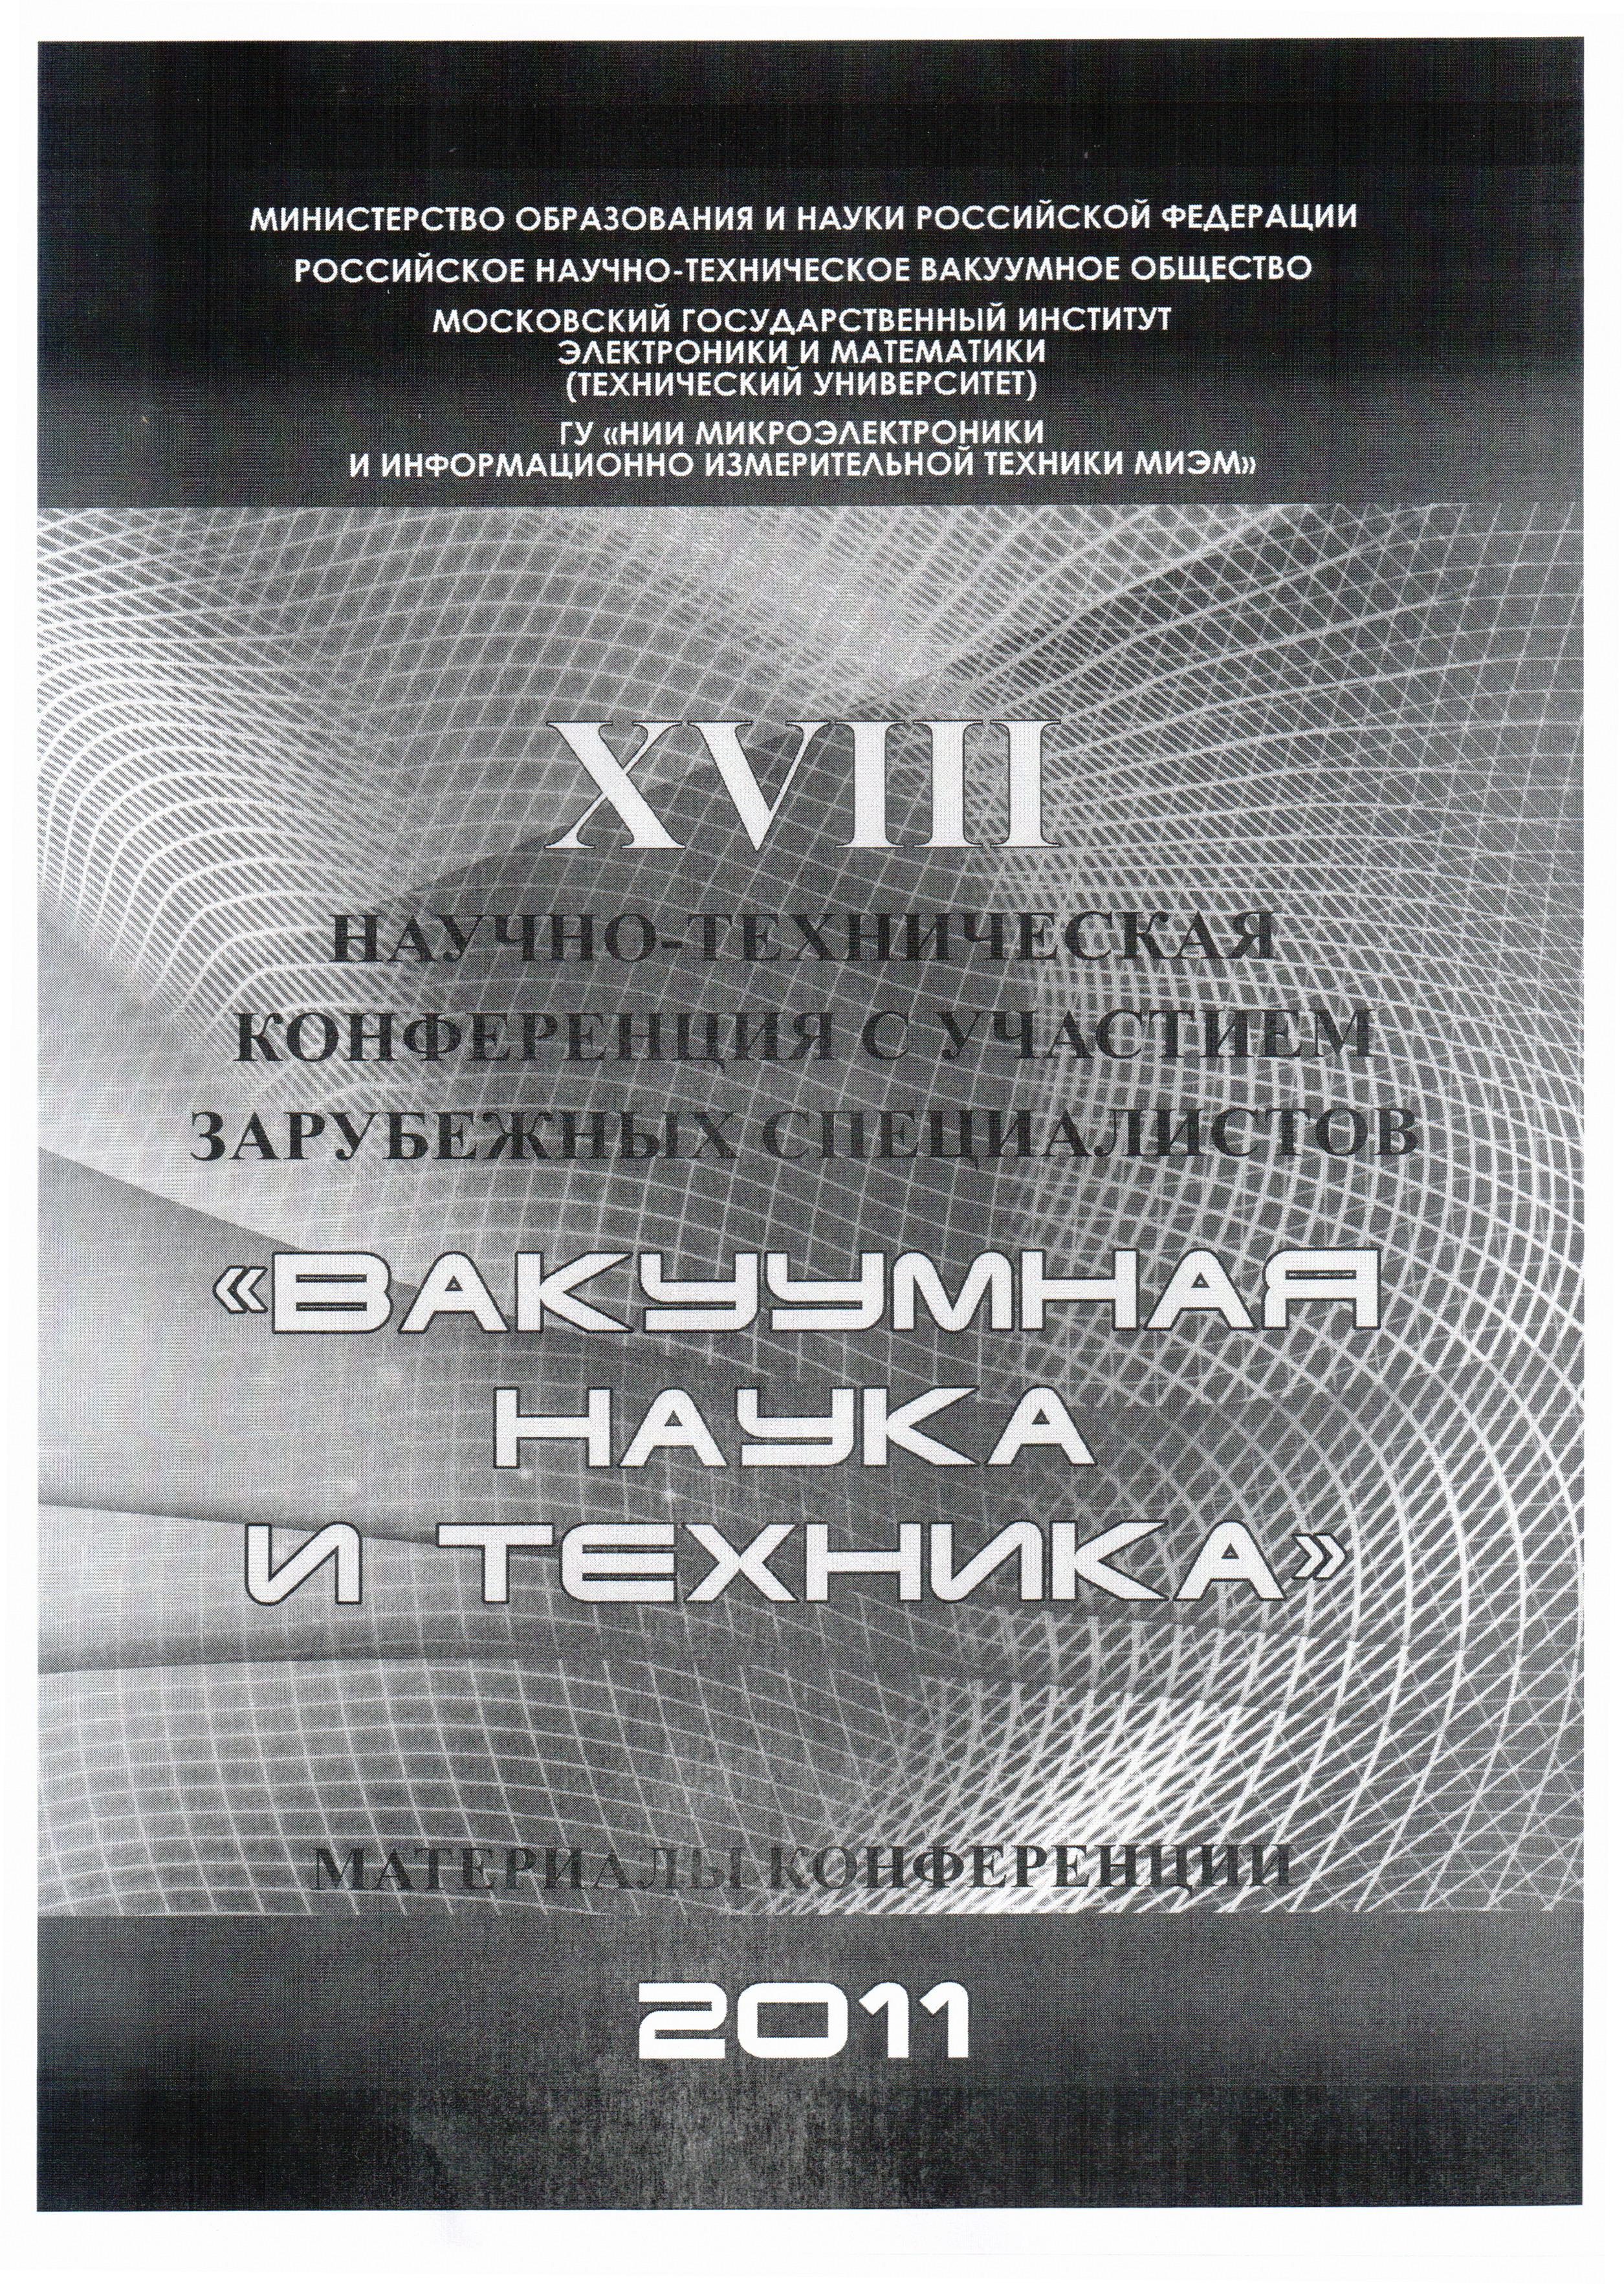 Вакуумная наука и техника. Материалы XVIII научно-технической конференции